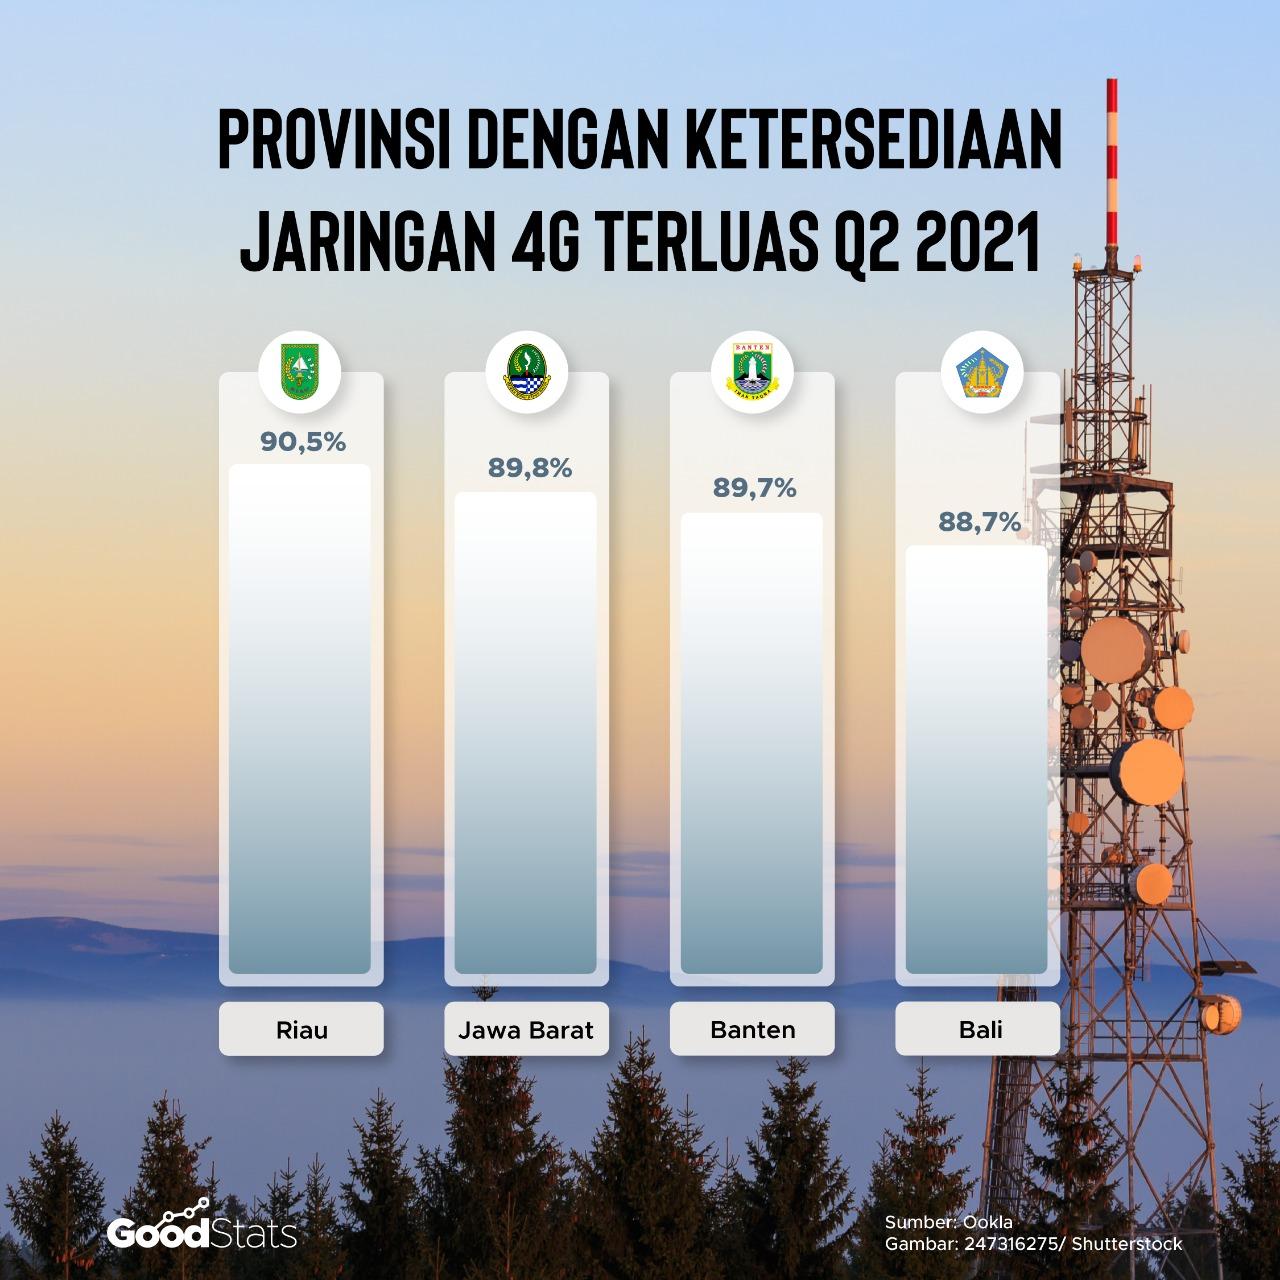 Provinsi dengan Ketersediaan Jaringan 4G Terluas | Goodstats